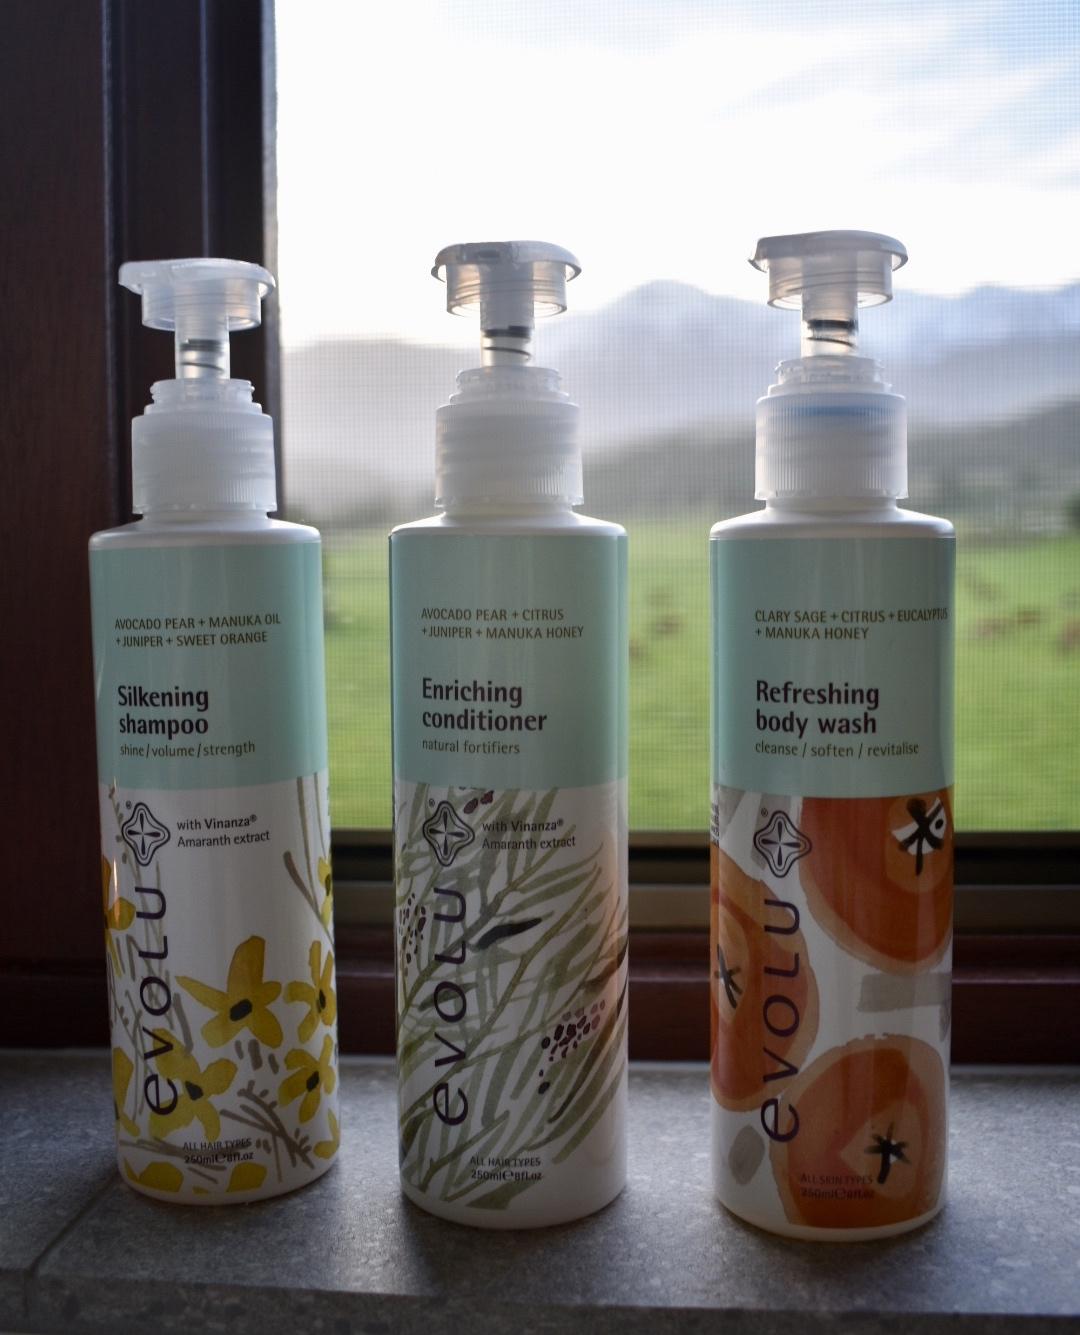 Evolu New Zealand Manuka Honey Skin Care